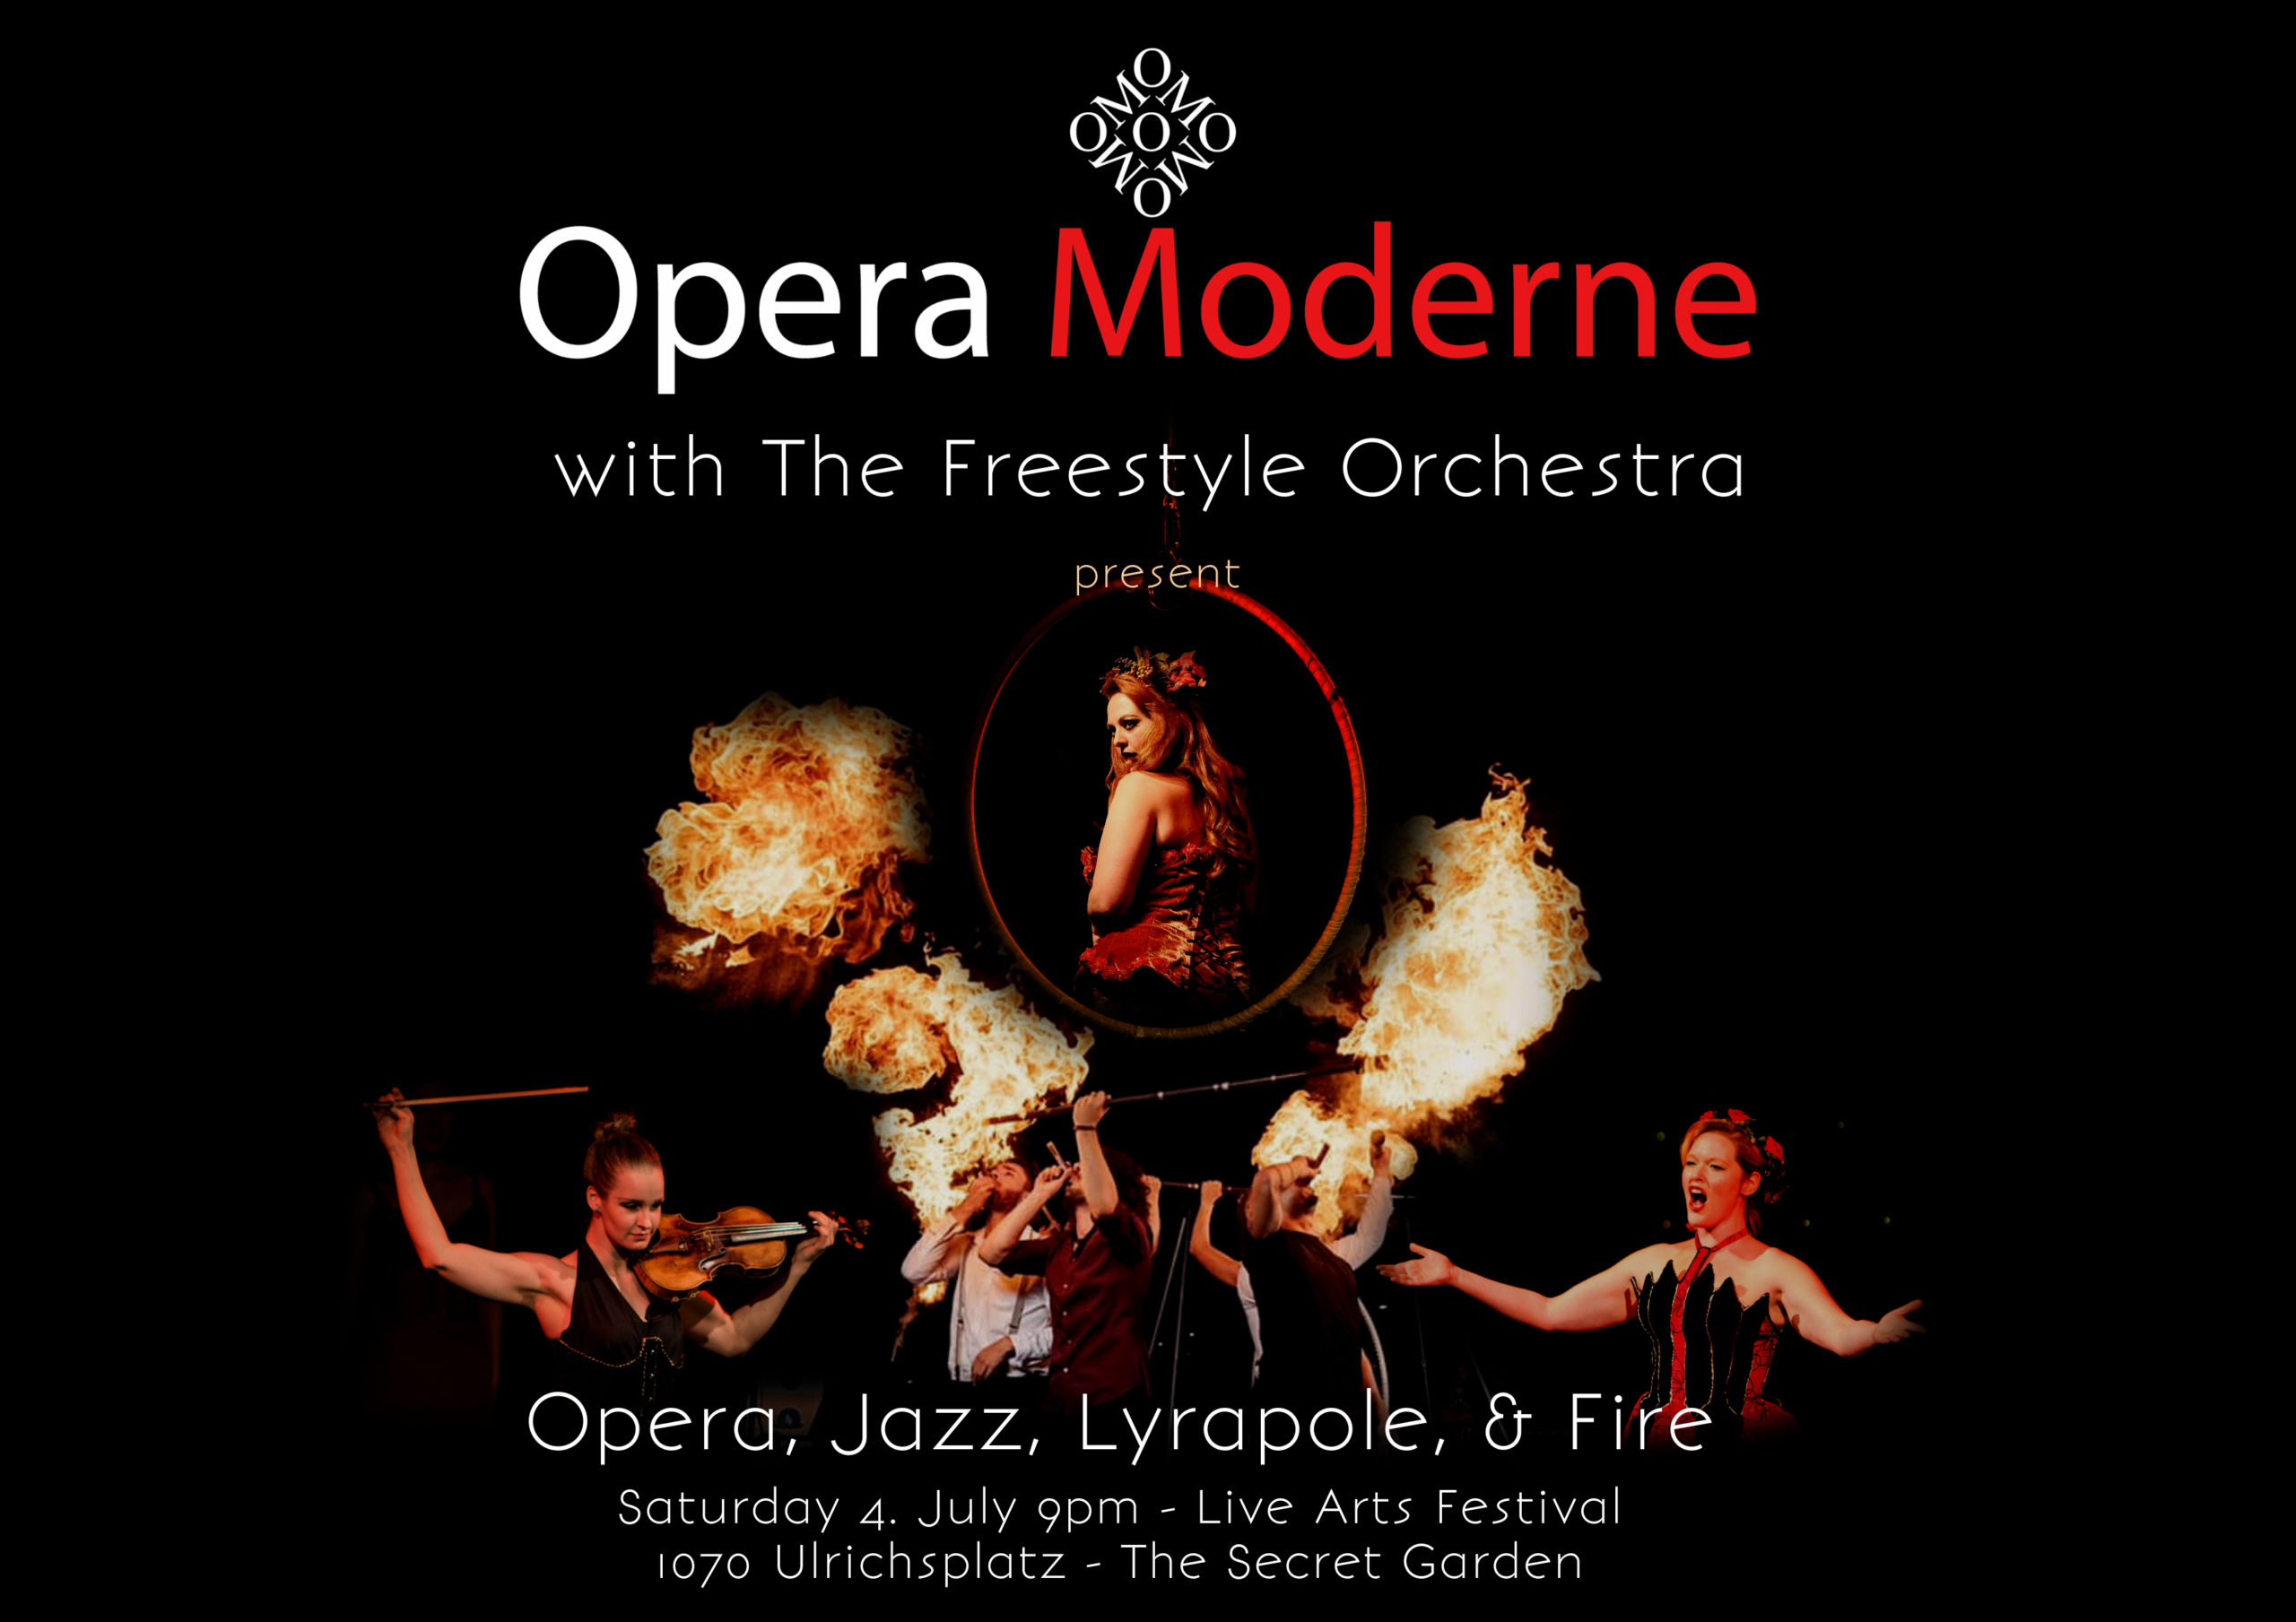 Opera, Jazz, Lyrapole & Fire - Life Art